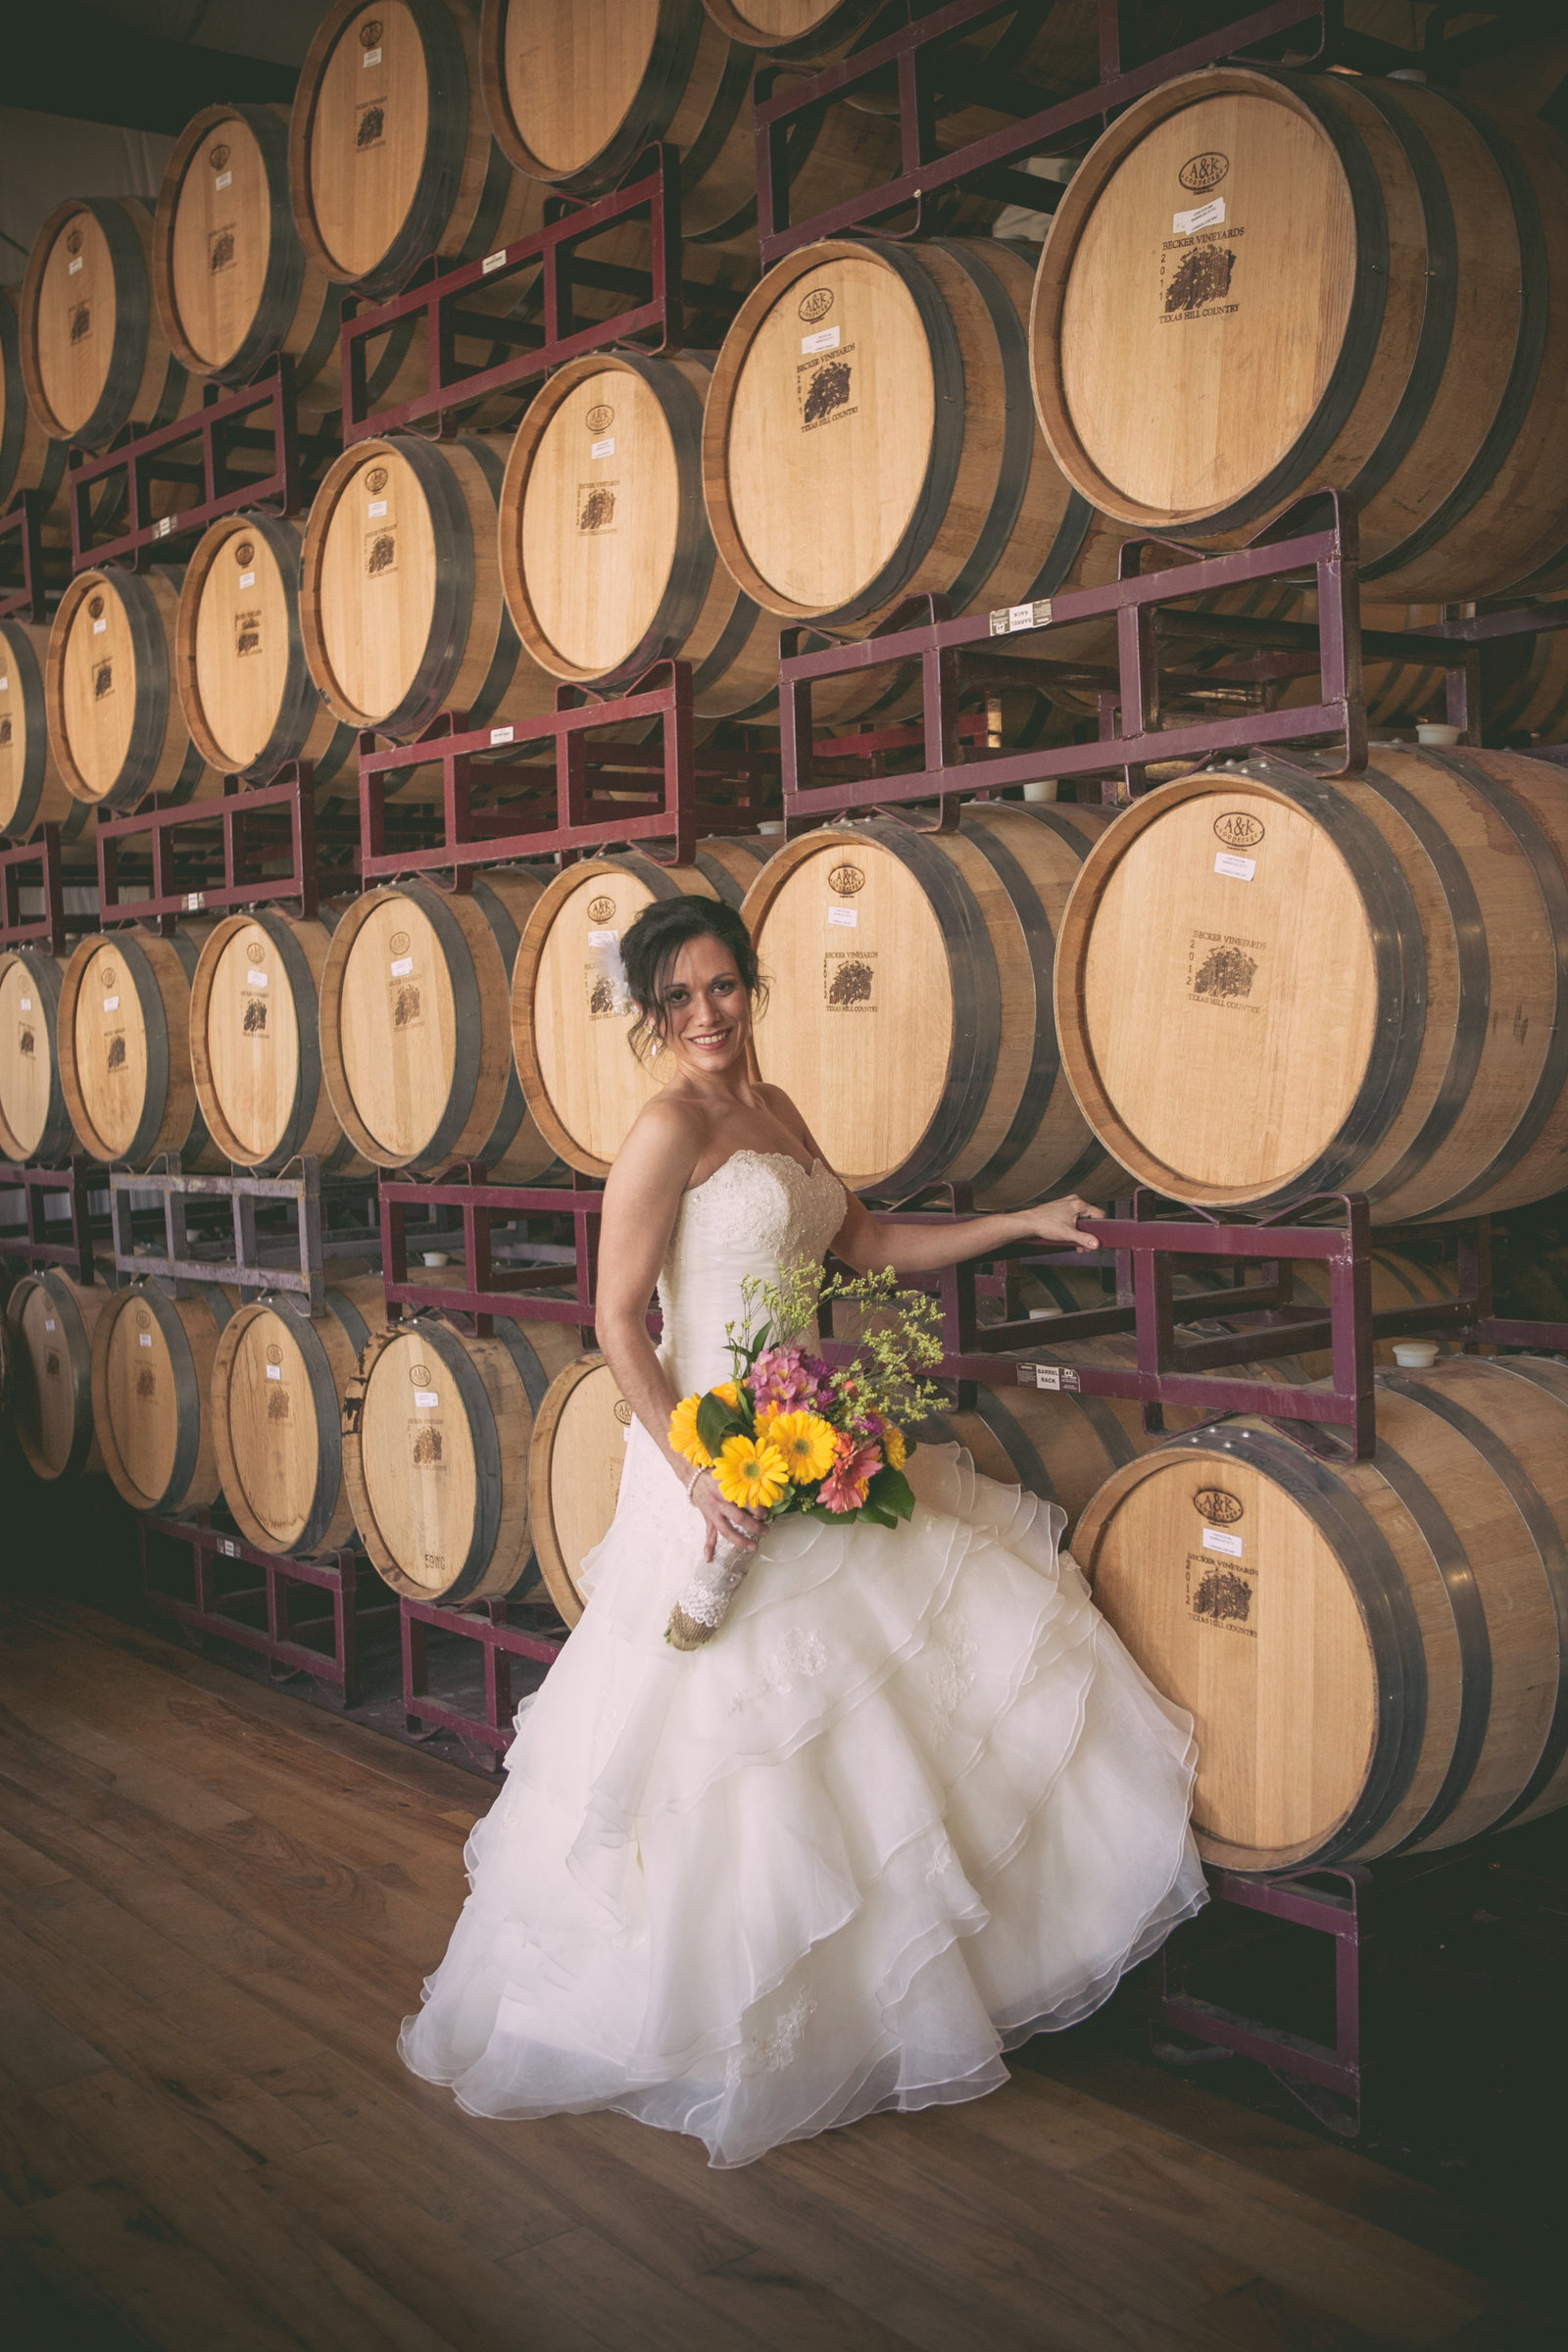 Austin Family Photographer, Tiffany Chapman, bride in barrel room photo